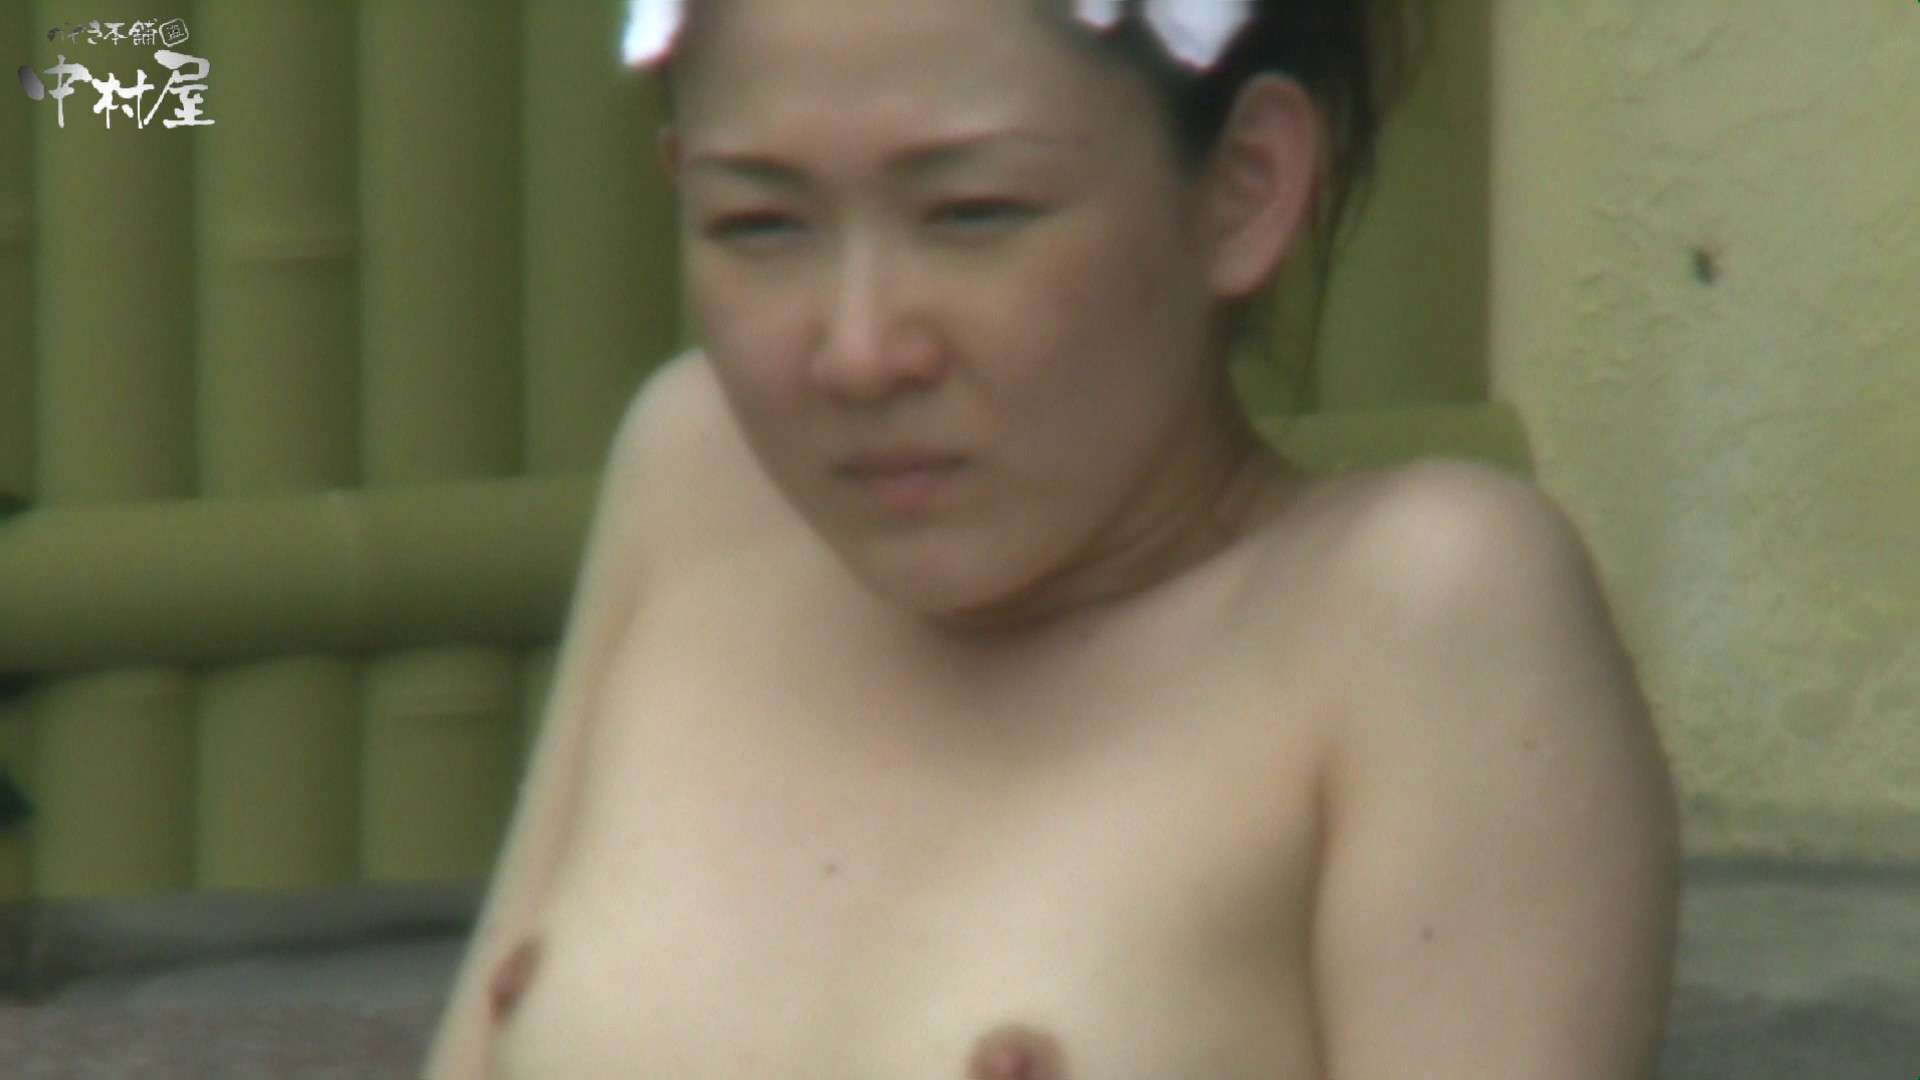 Aquaな露天風呂Vol.943 盗撮 セックス無修正動画無料 108画像 62